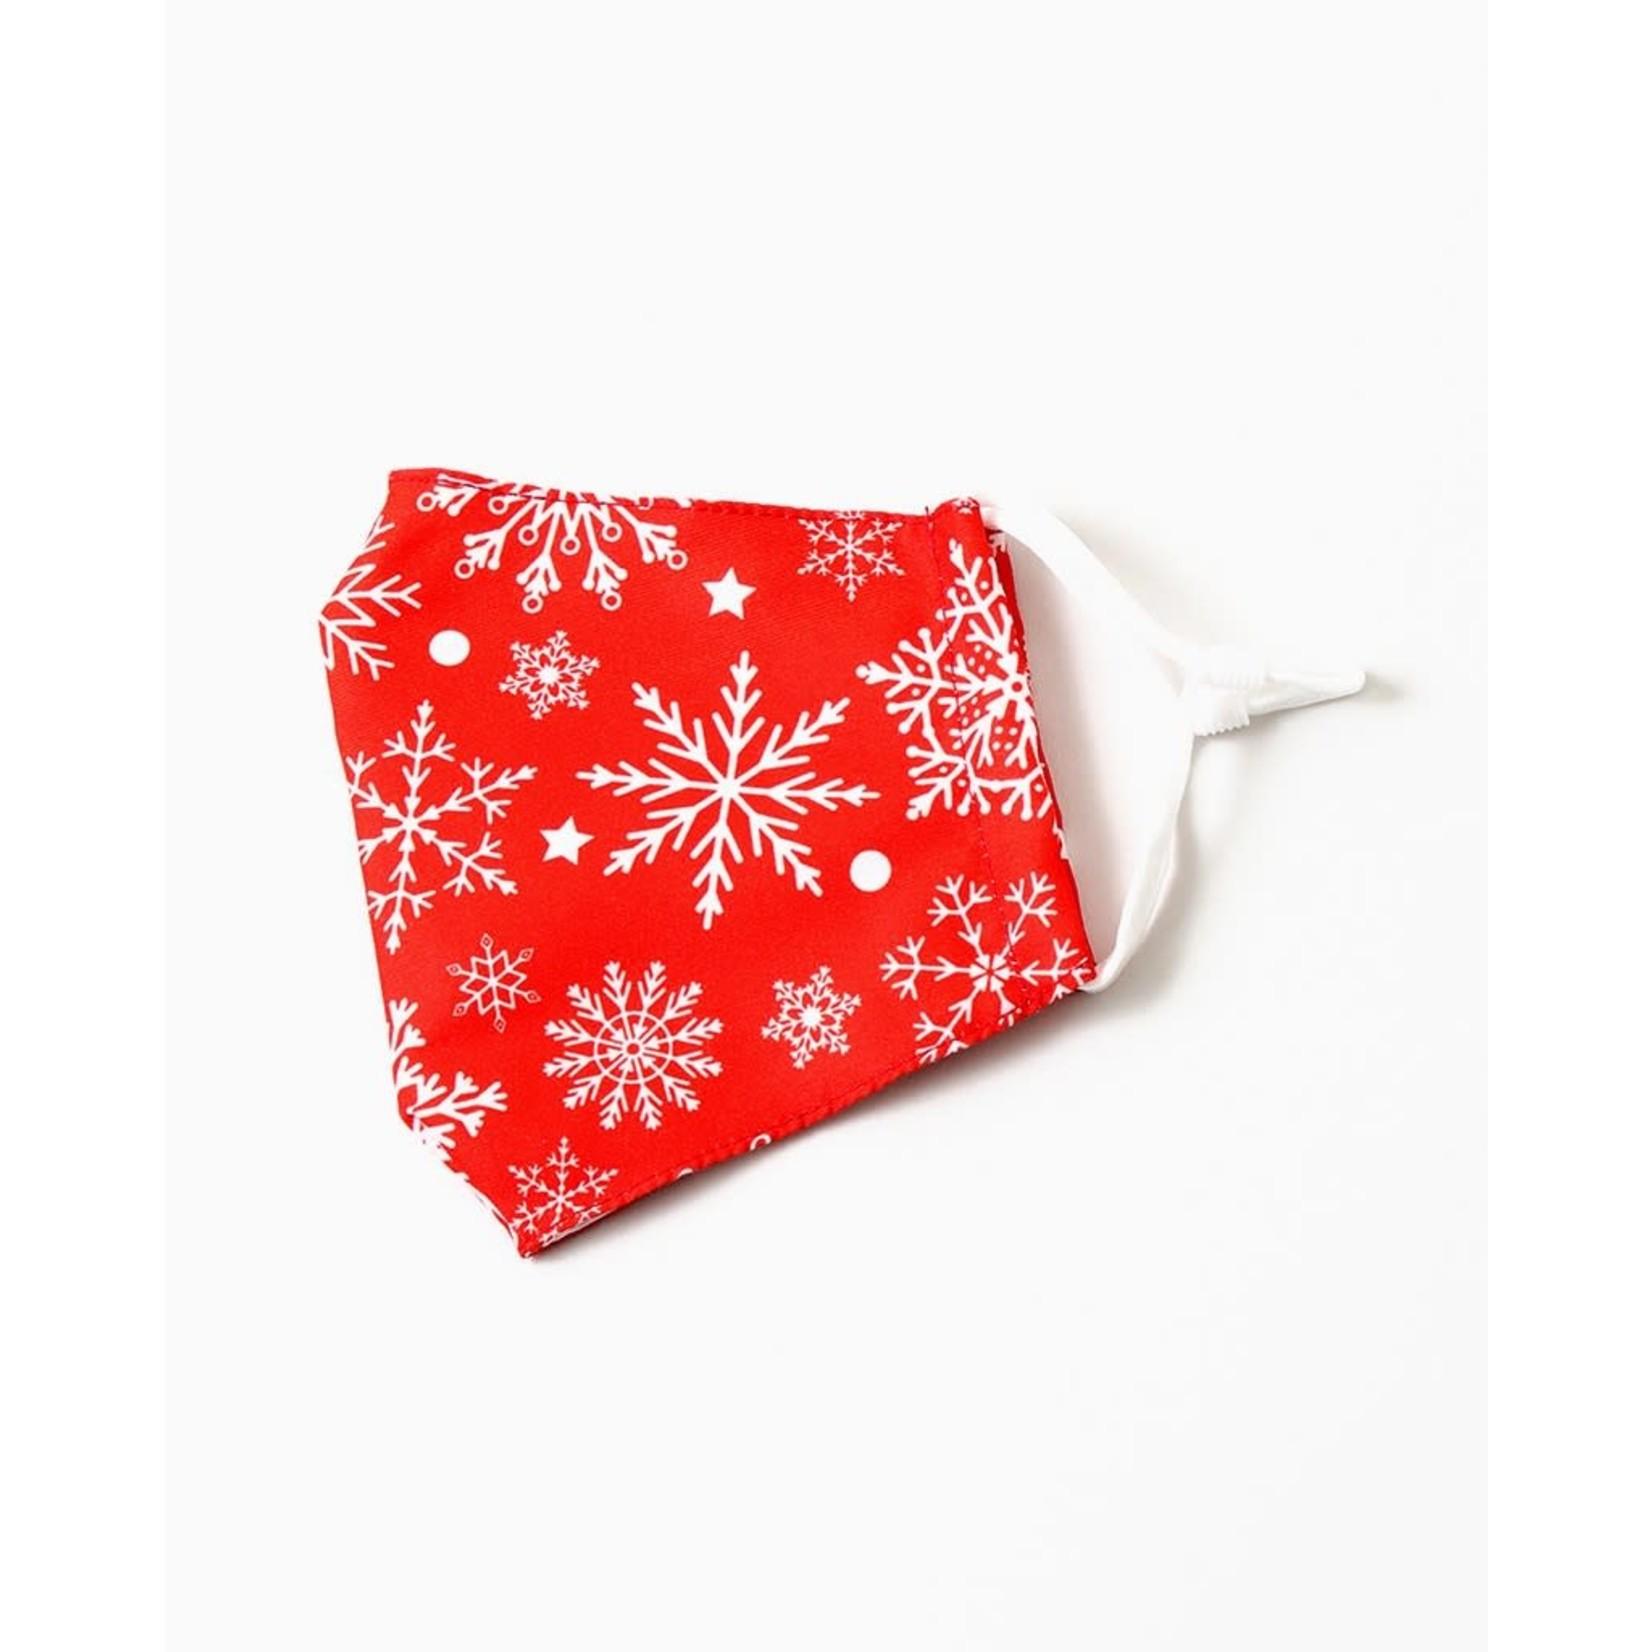 EM & ELLE Holiday Snowflake Mask